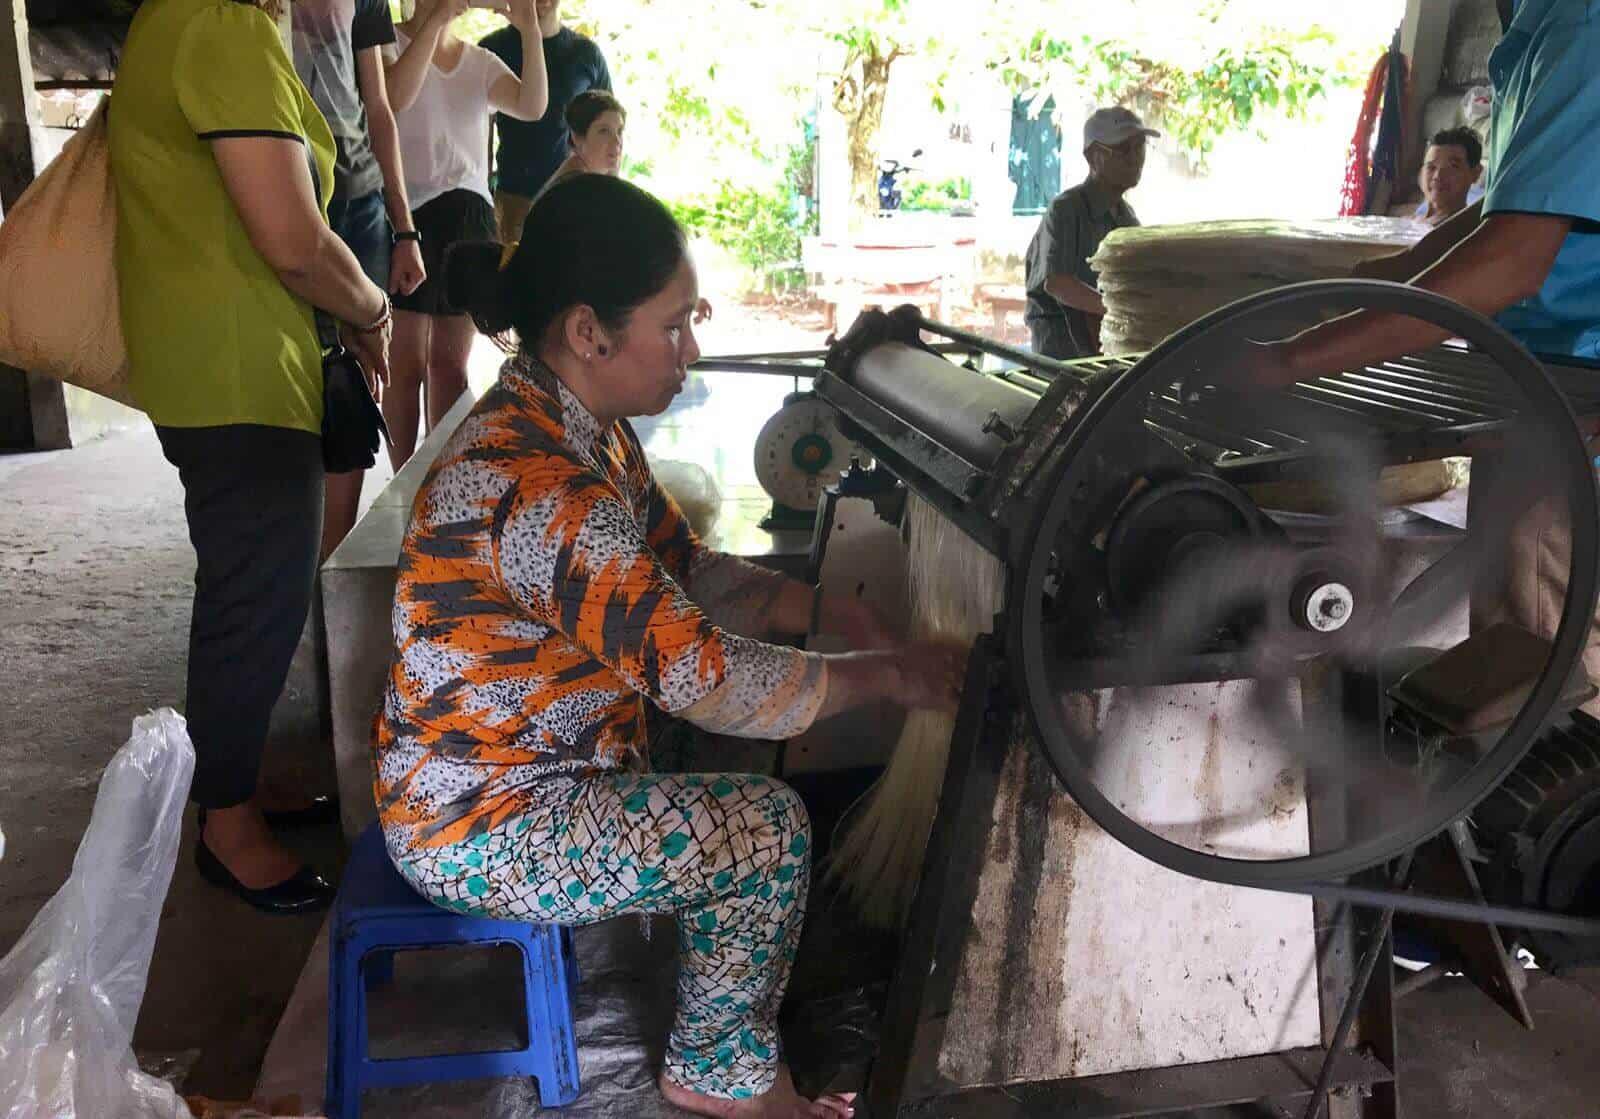 Rice Noodles Factory Mekong Delta Vietnam betternotstop Hannah